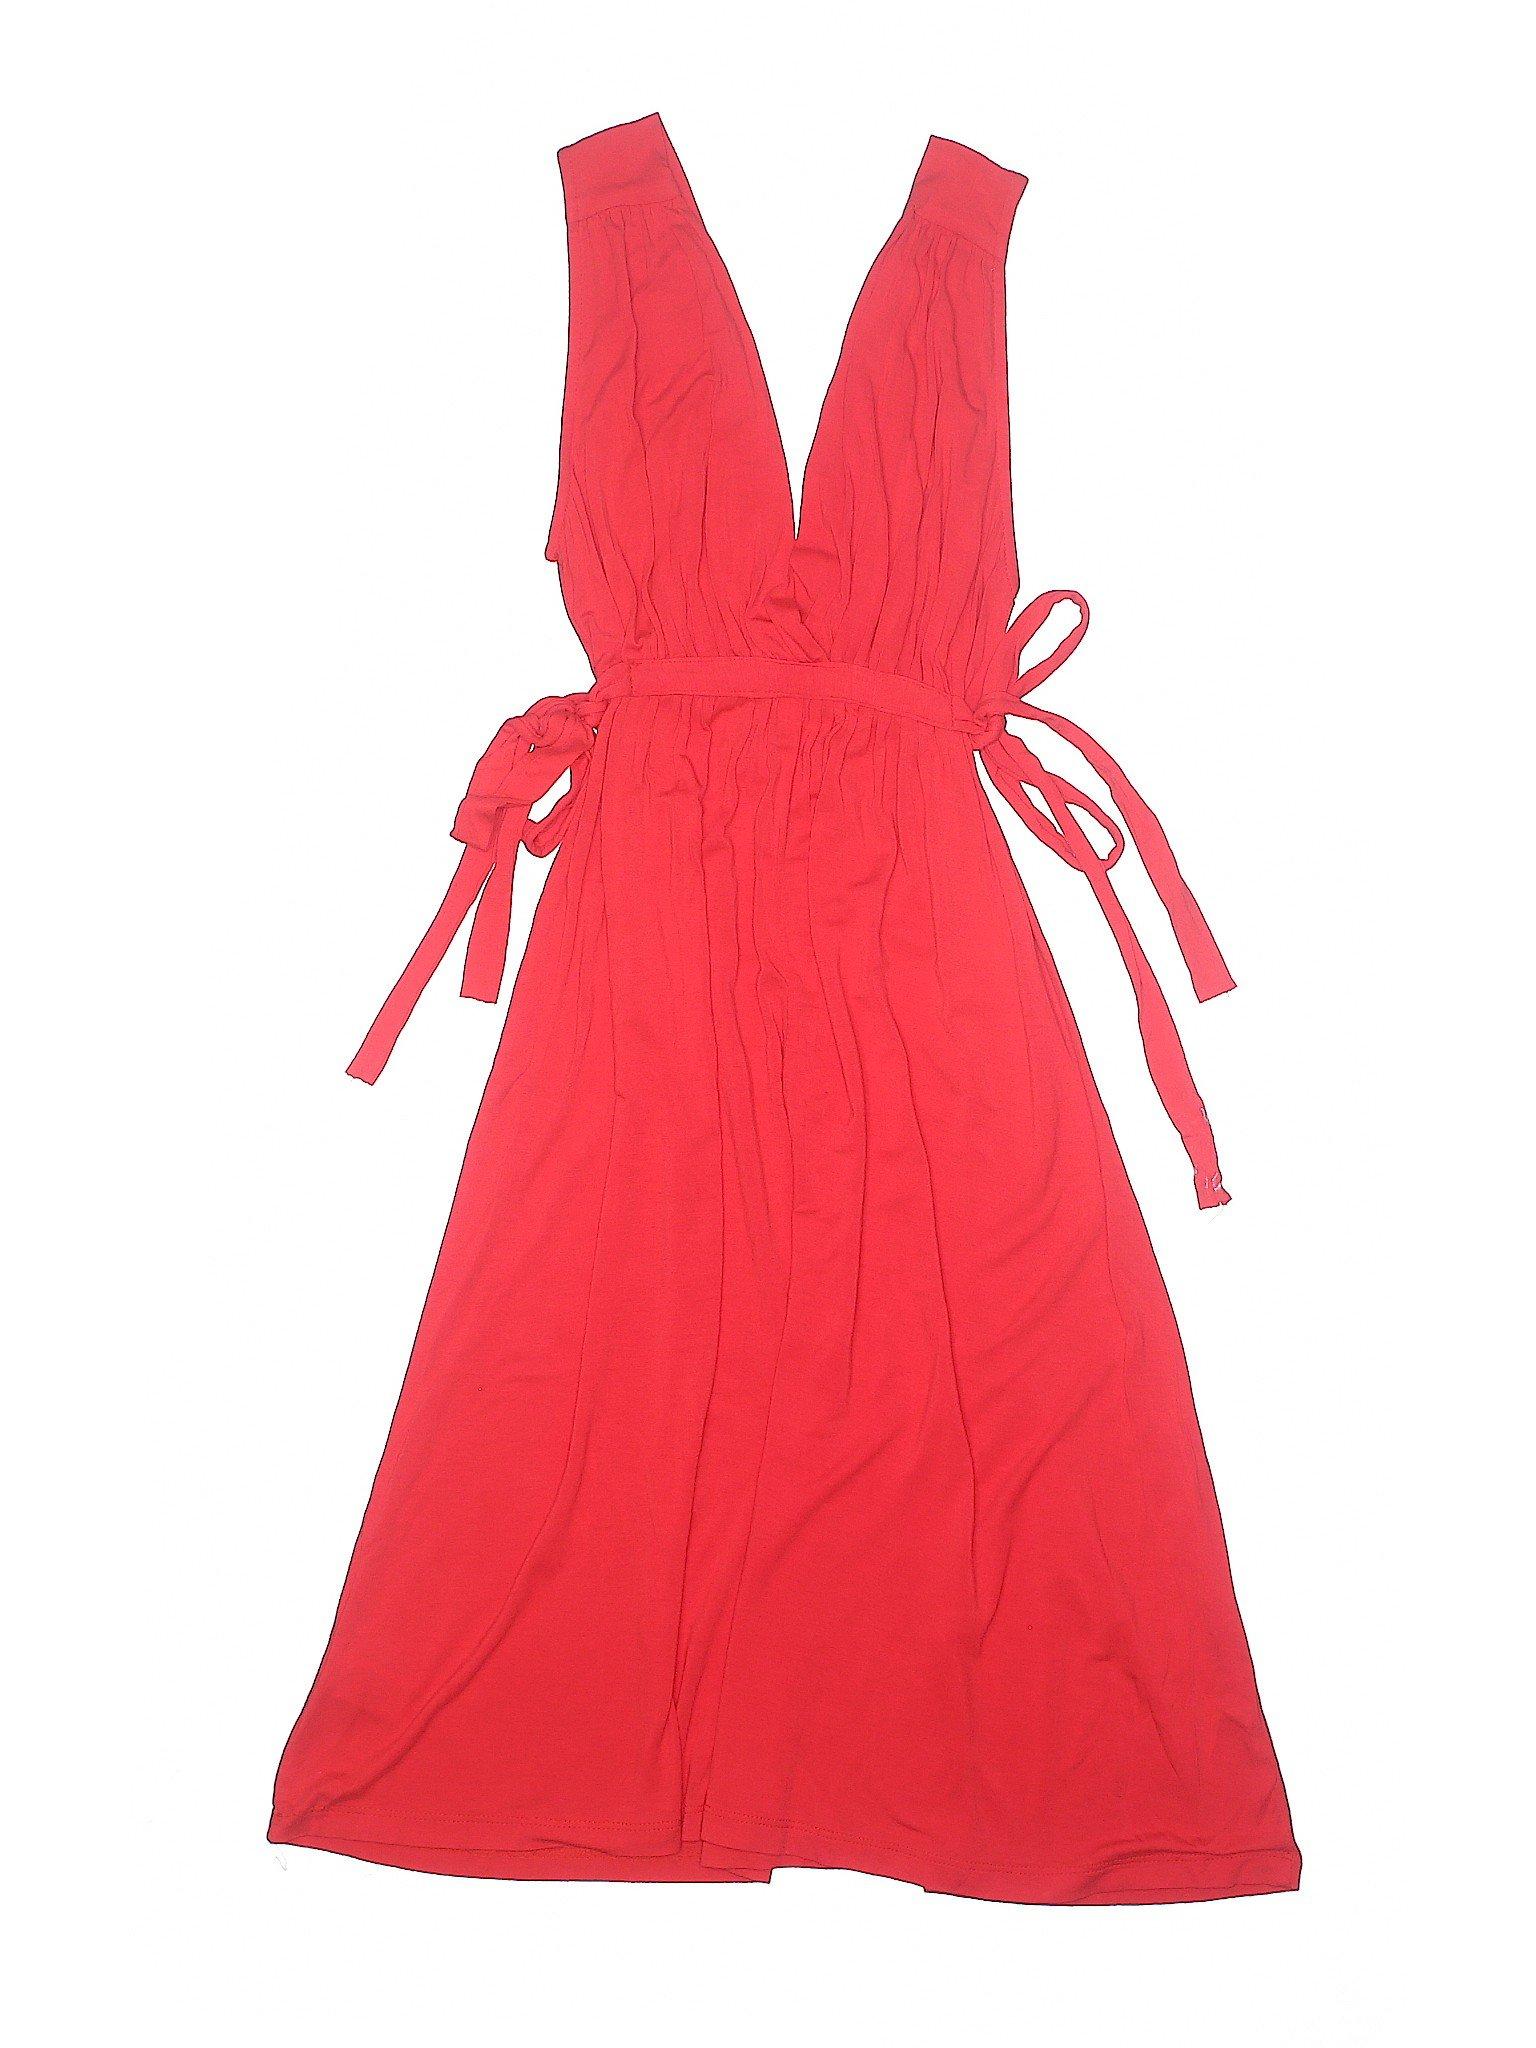 Dress Twenty Dress Casual Selling Selling One Casual Selling One Twenty qcfwxI16